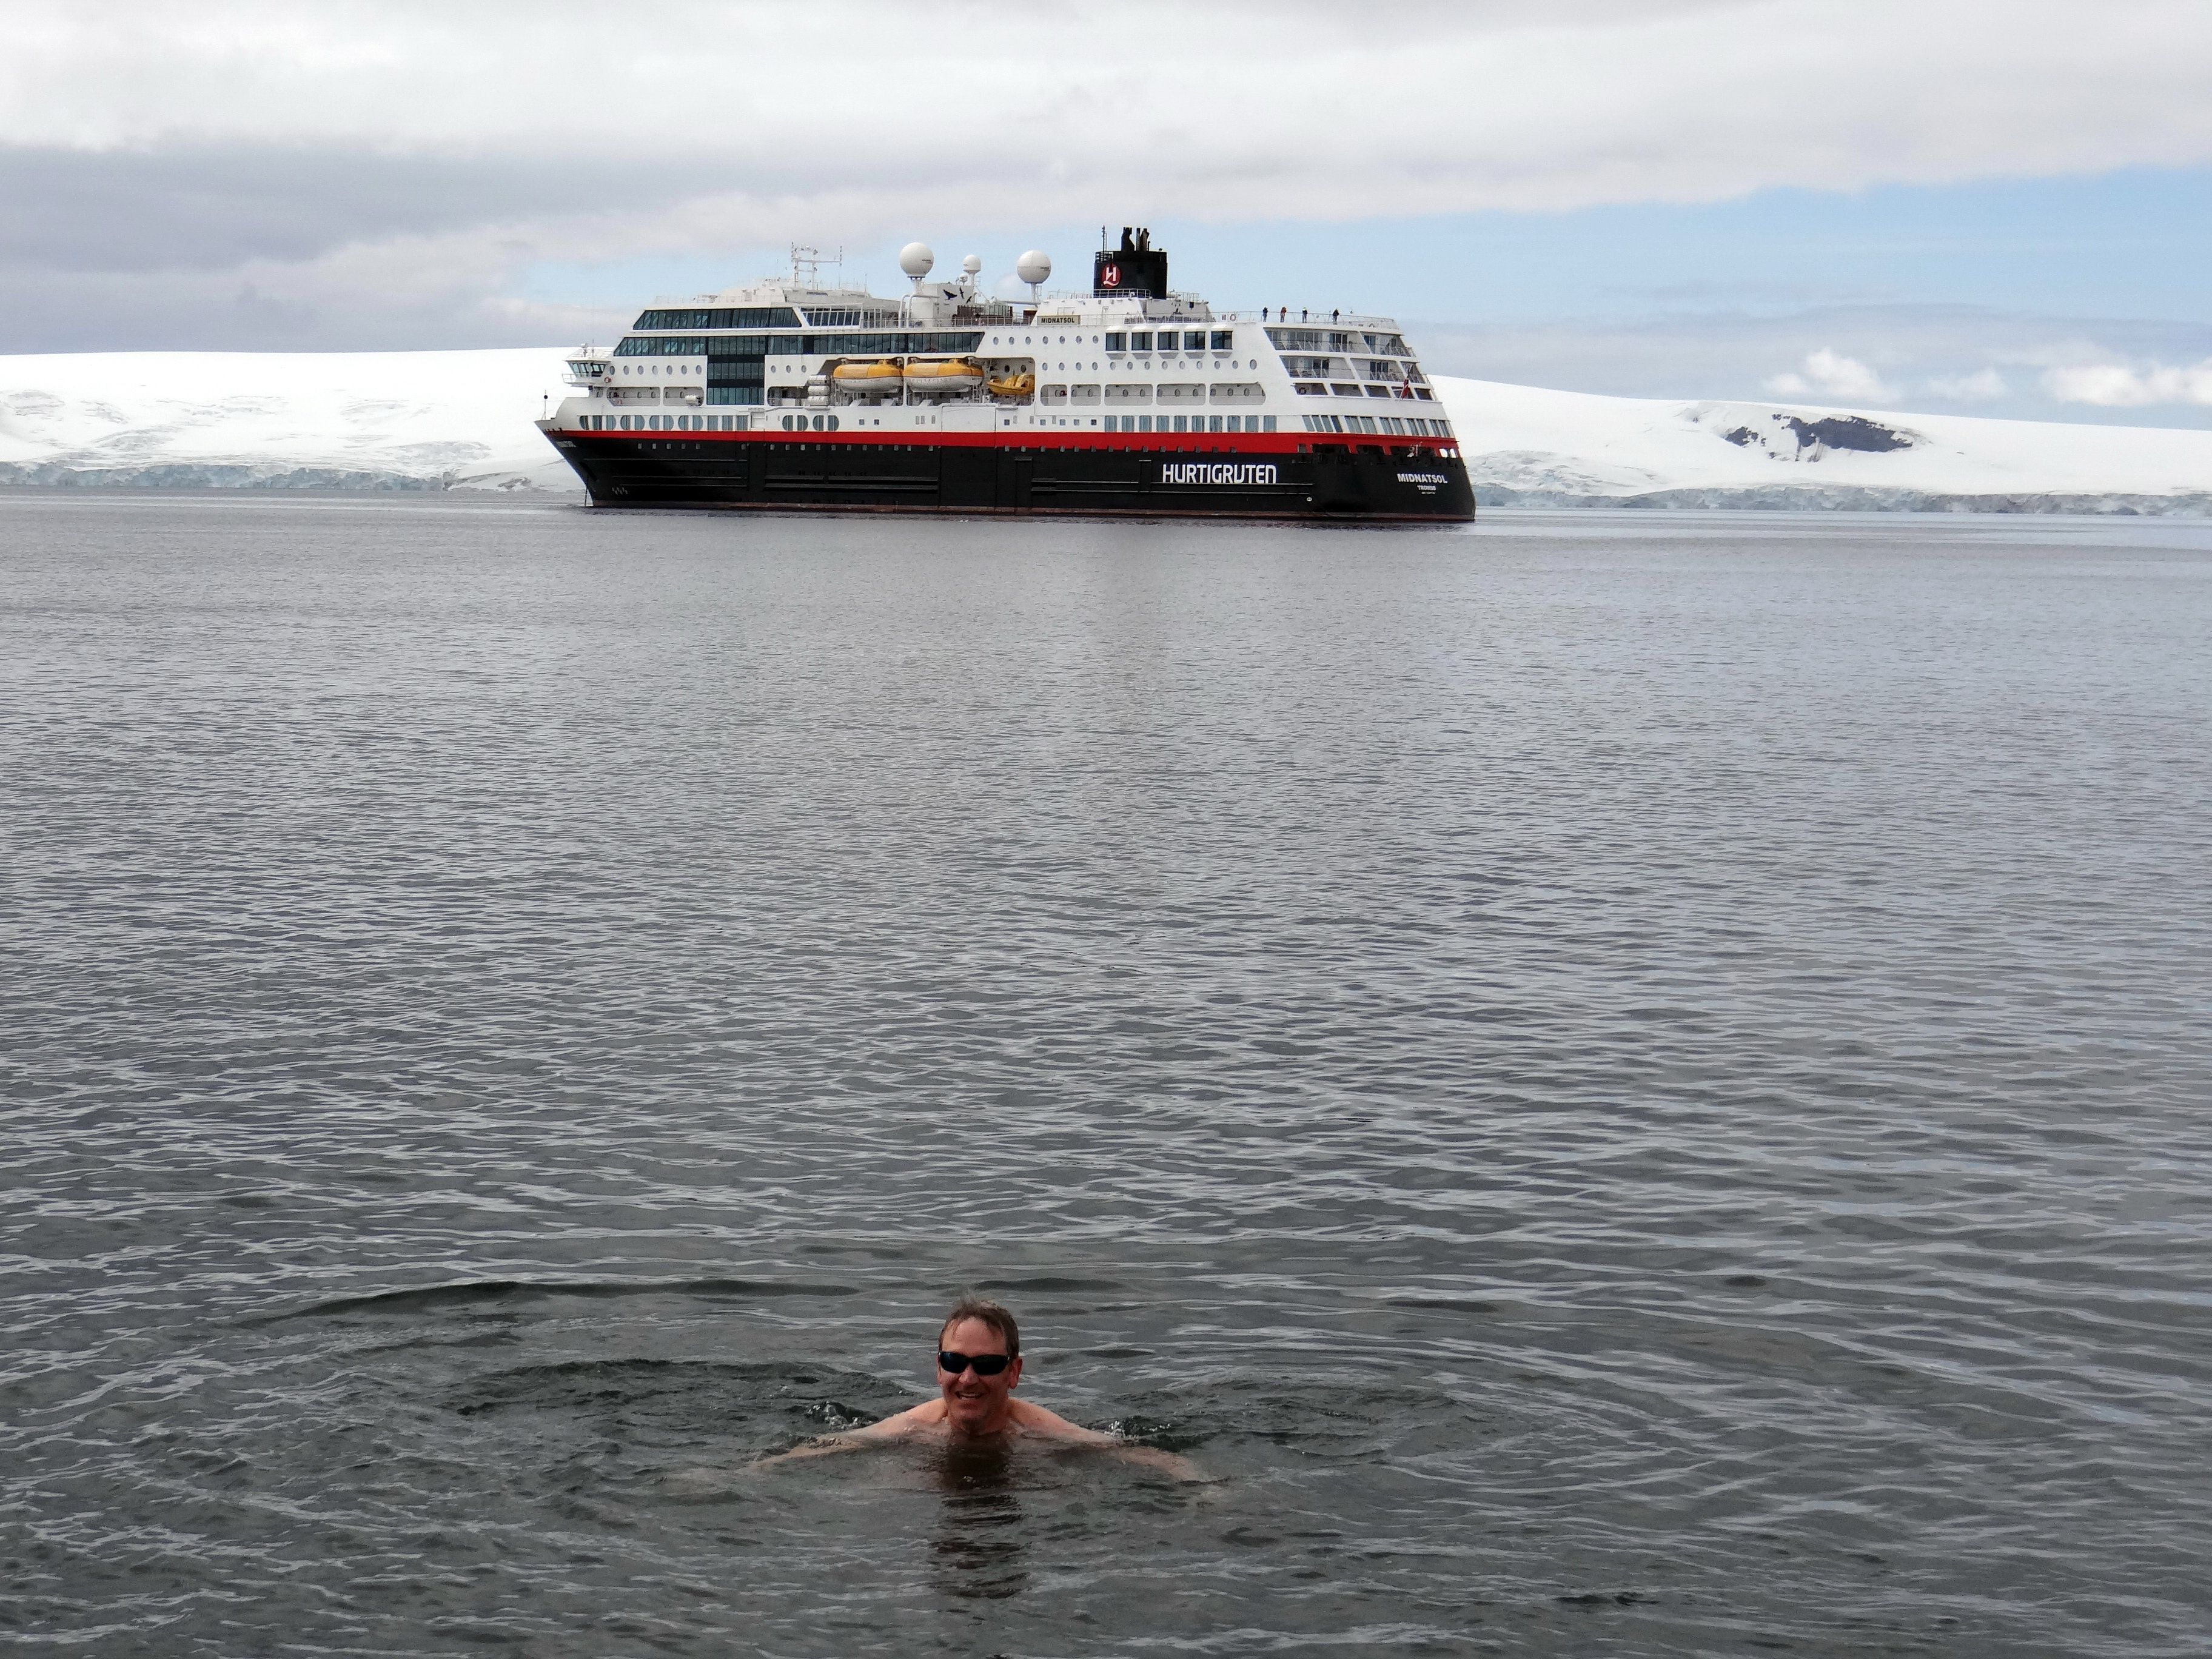 Swimming in Antarctica from the Hurtigruten Midnatsol